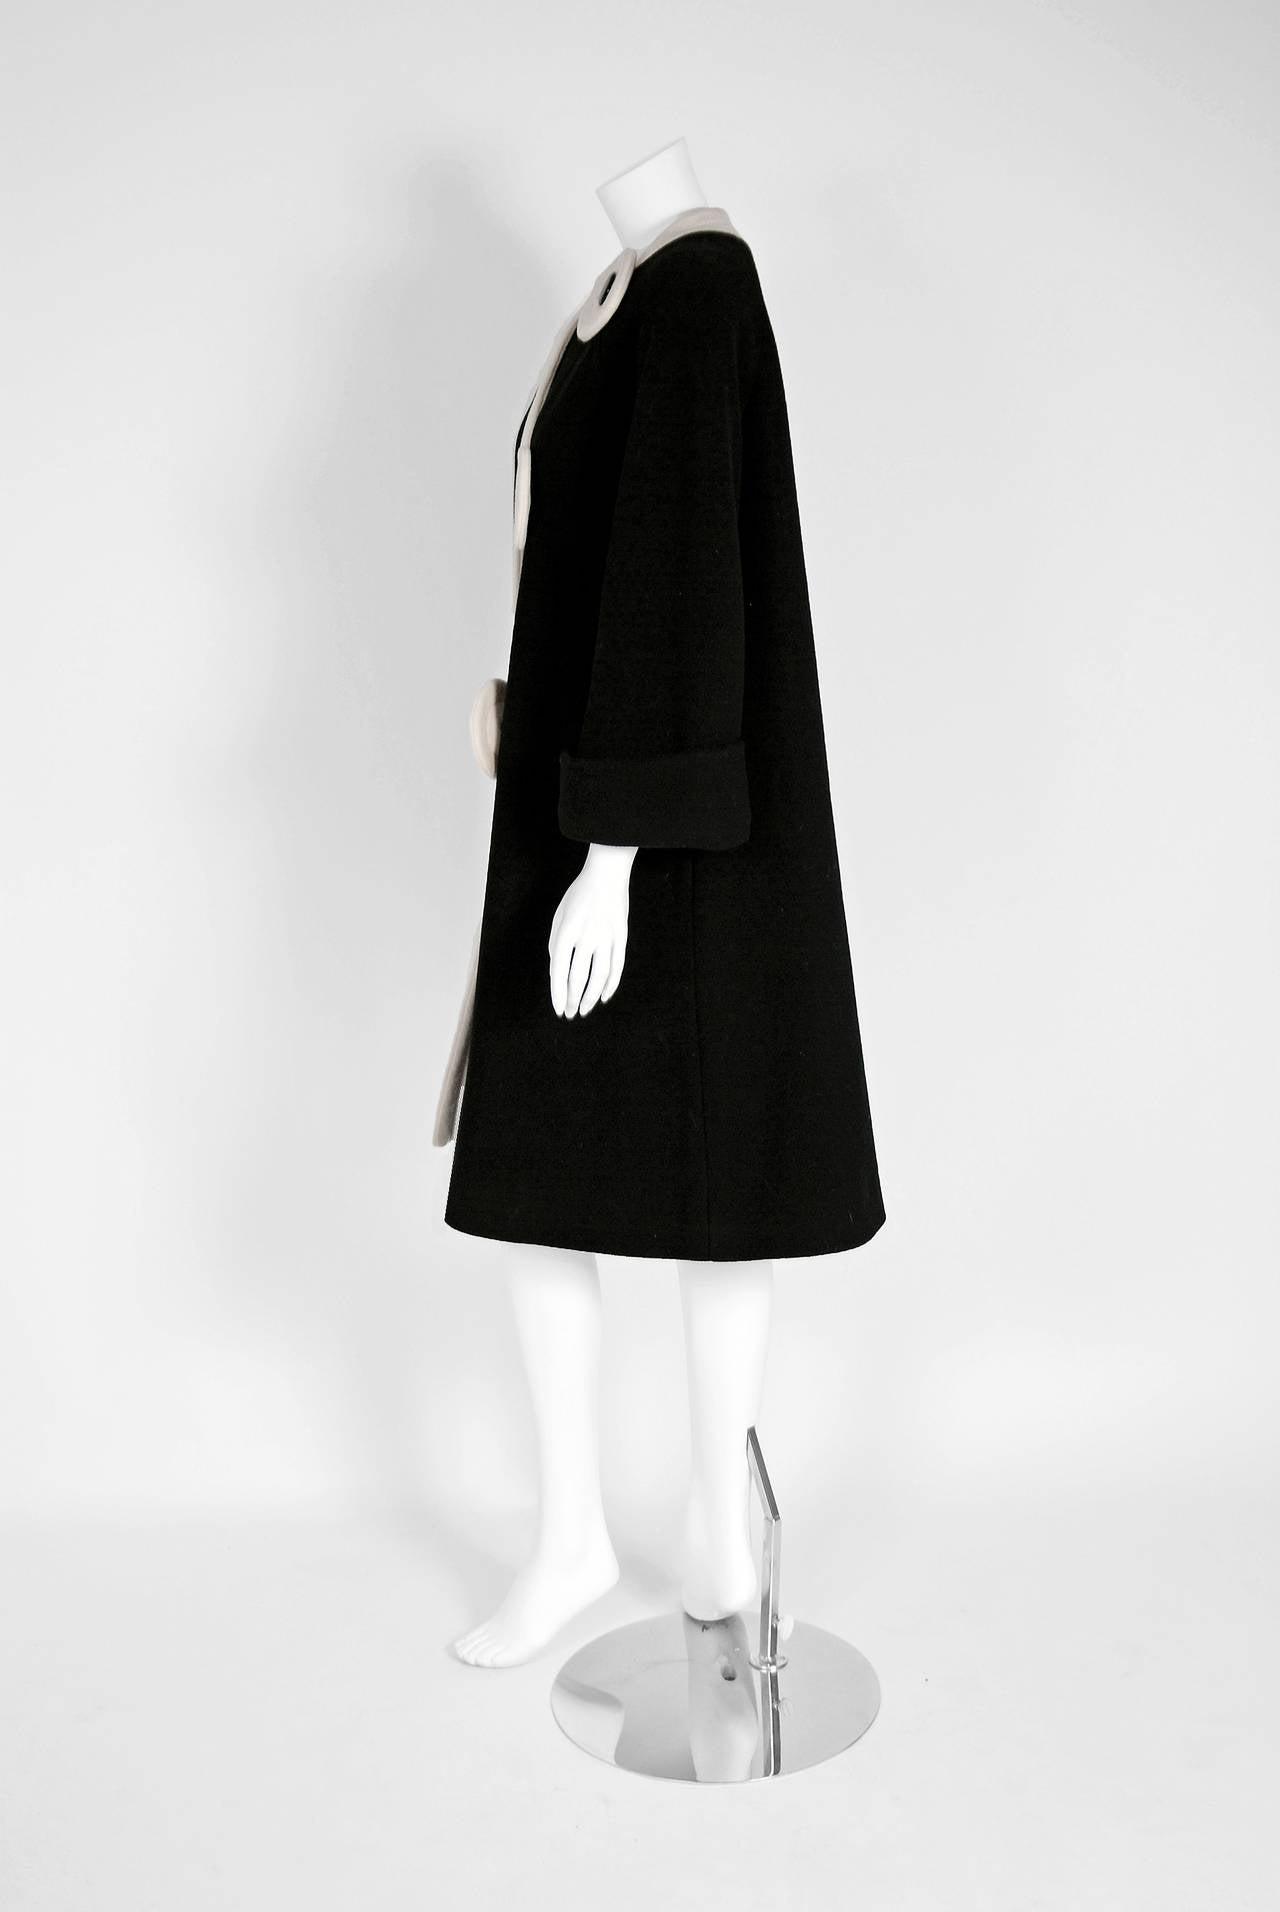 1960's Pierre Cardin Black & Ivory Block-Color Wool Mod Space-Age Swing Coat For Sale 1